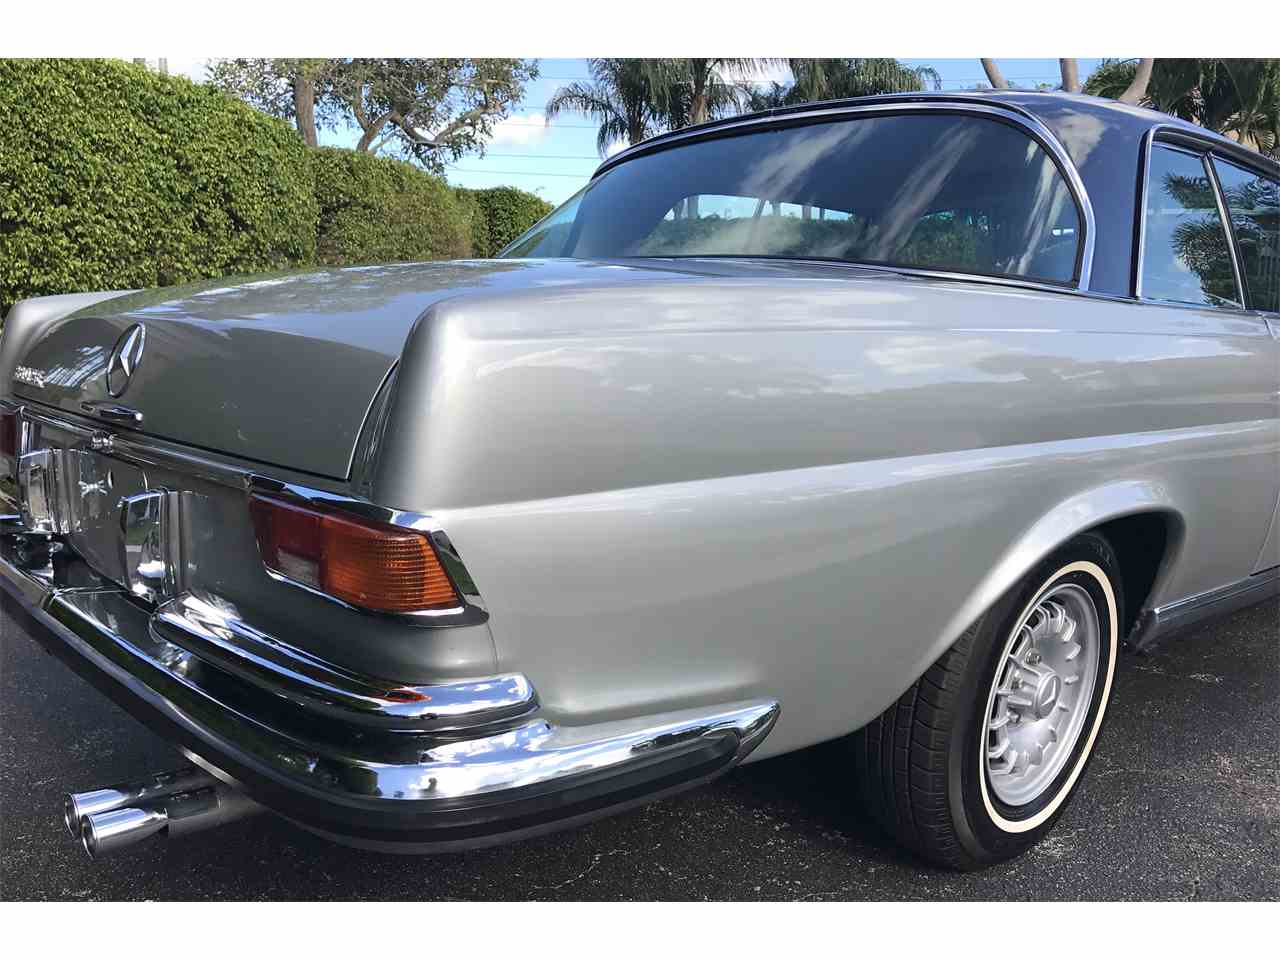 1970 mercedes benz 280se for sale cc for Mercedes benz for sale florida